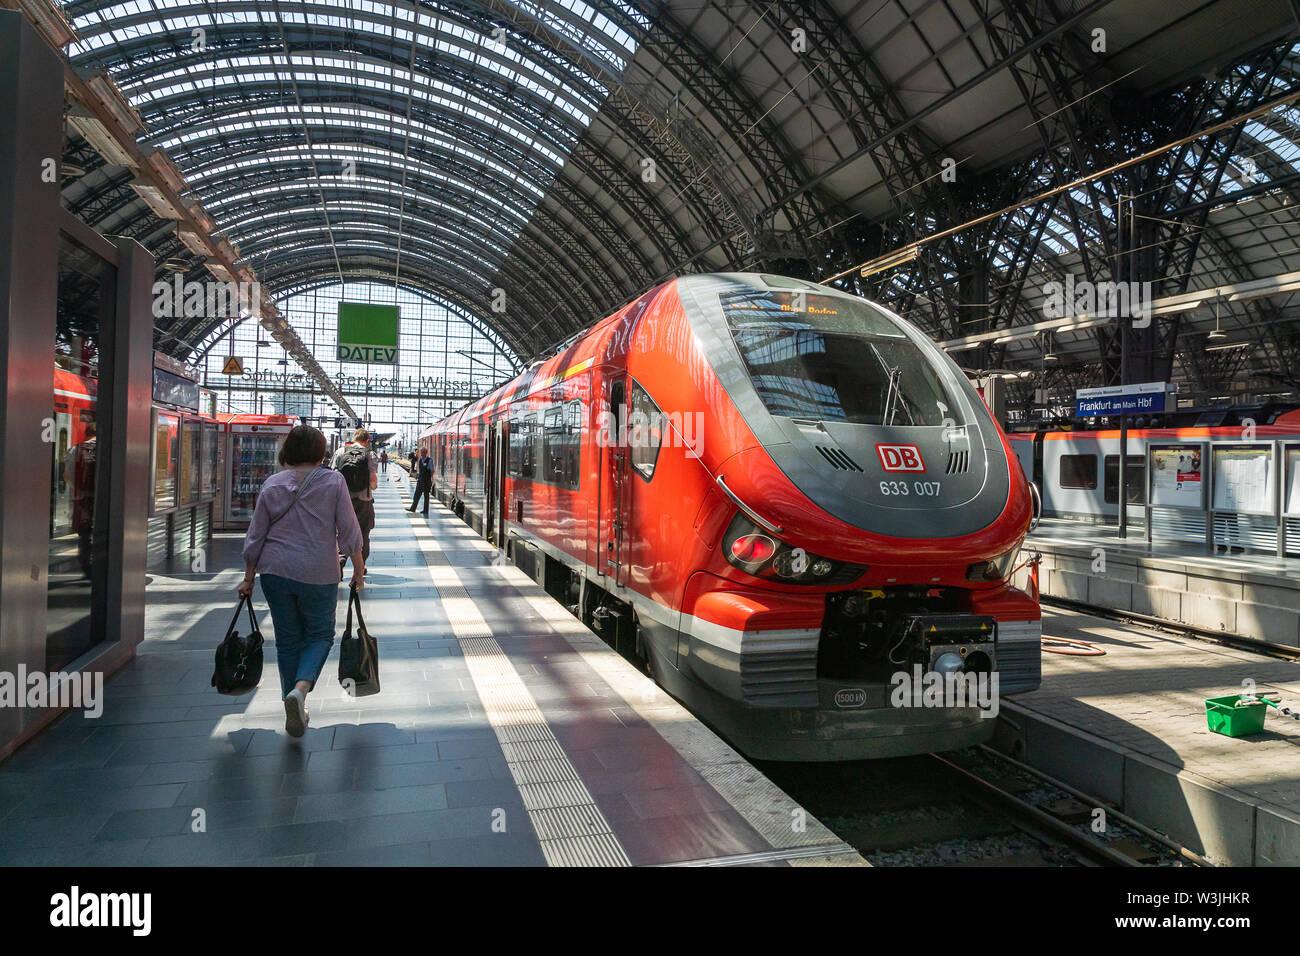 Frankfurt, Germany - July 2019: DB, Deutsch Bahn, trains and passengers at Frankfurt Main Train station platform. Stock Photo